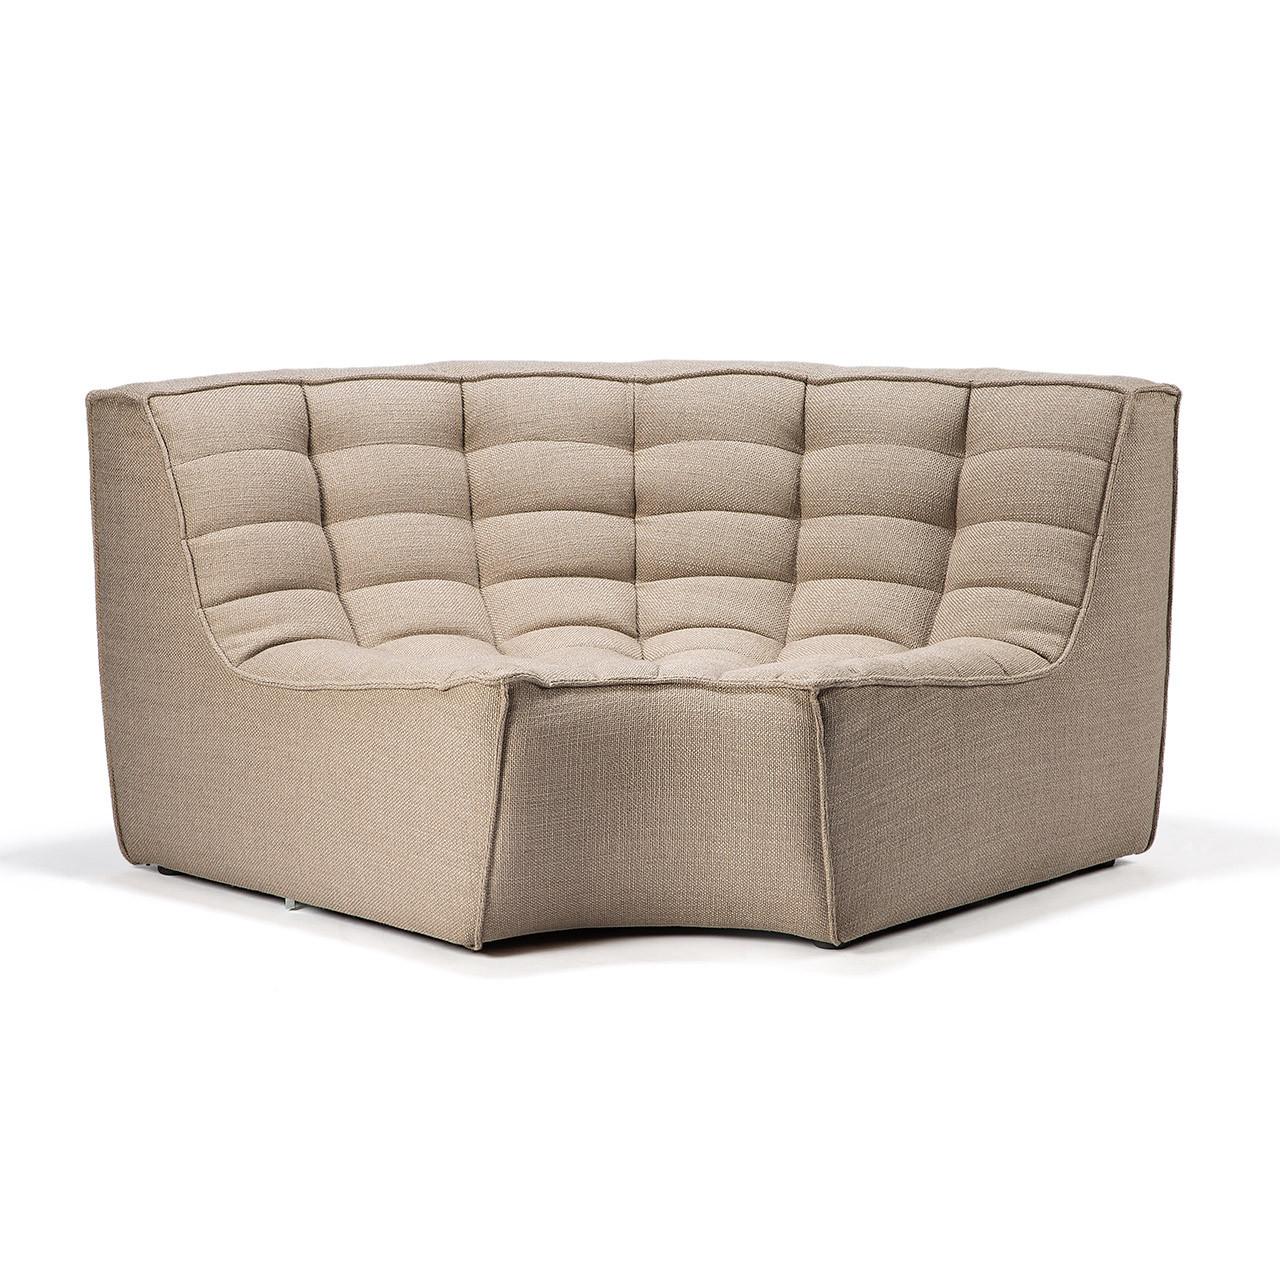 Roset Modern Modular Sectional Sofa - Round Corner